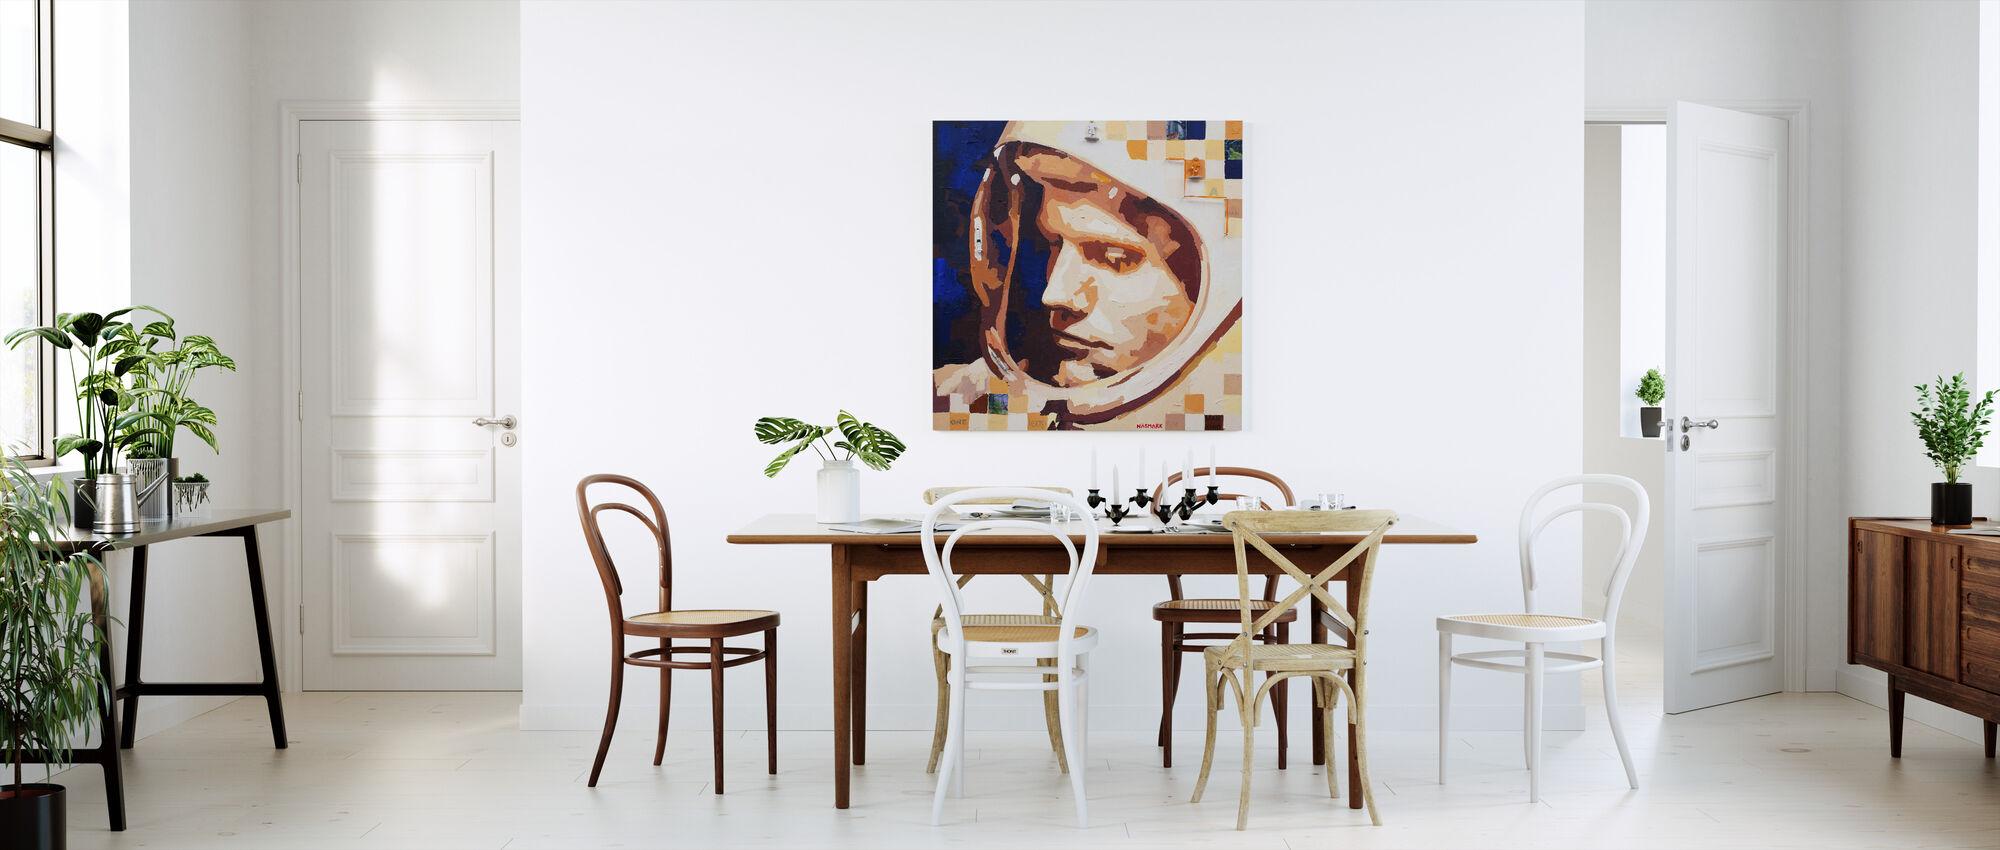 One Big Leap - Canvas print - Kitchen